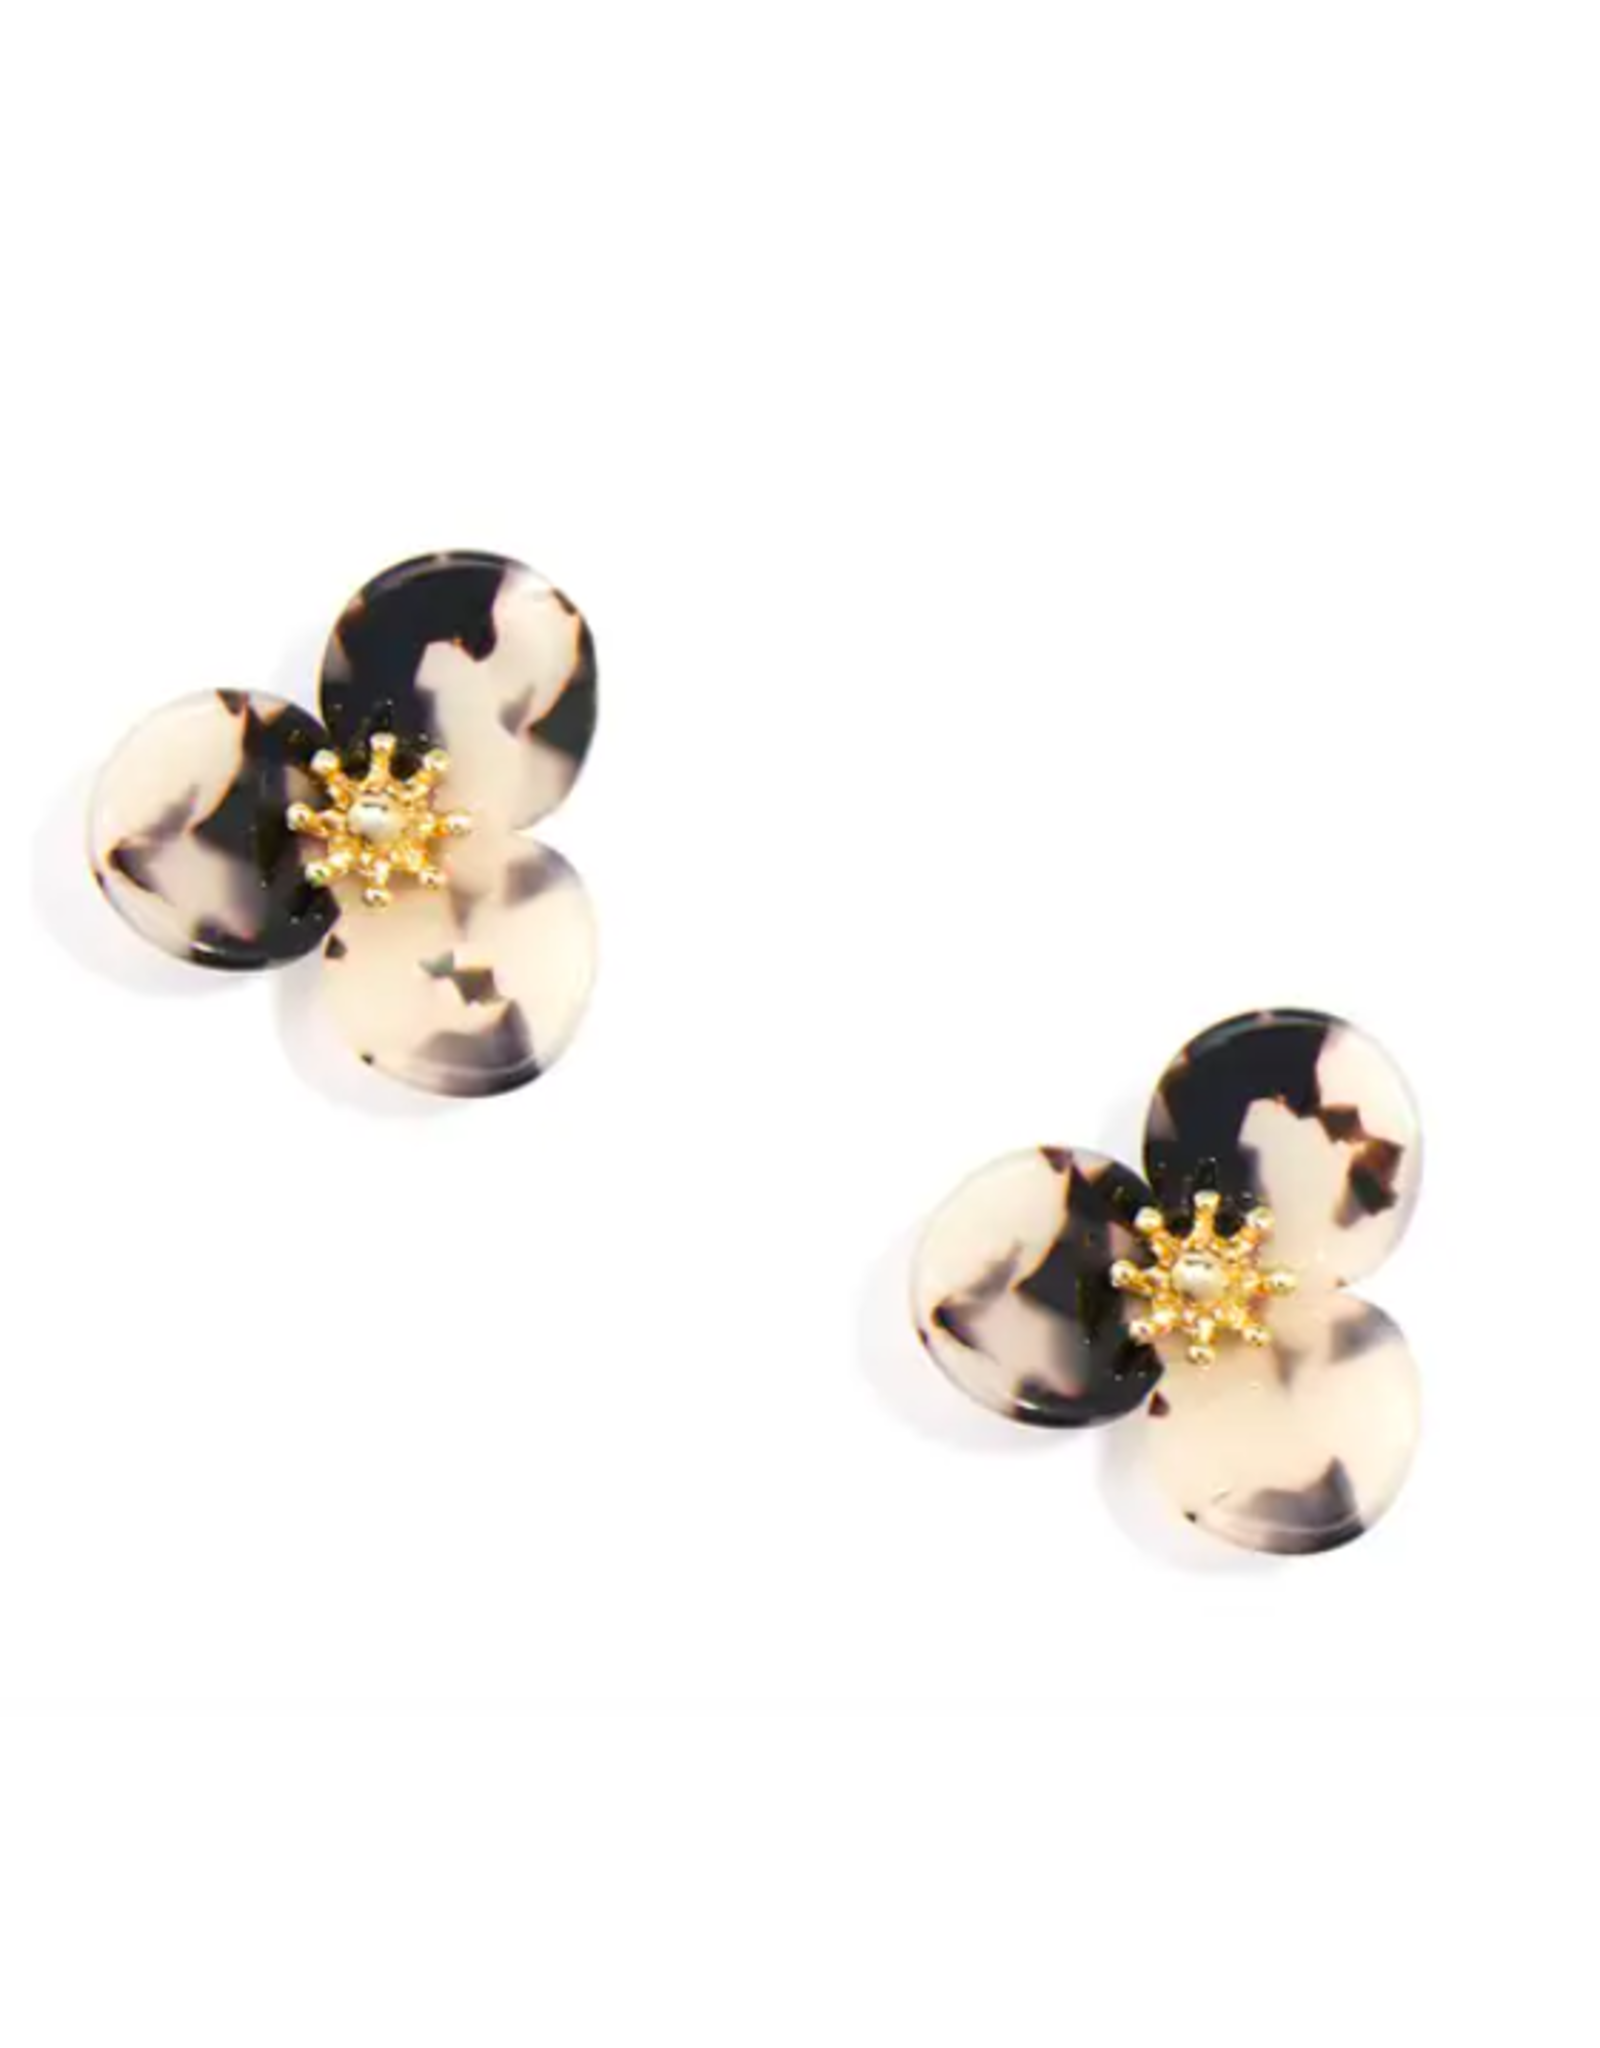 Zenzii Small Tortoise Flower Earring in Black and Tan